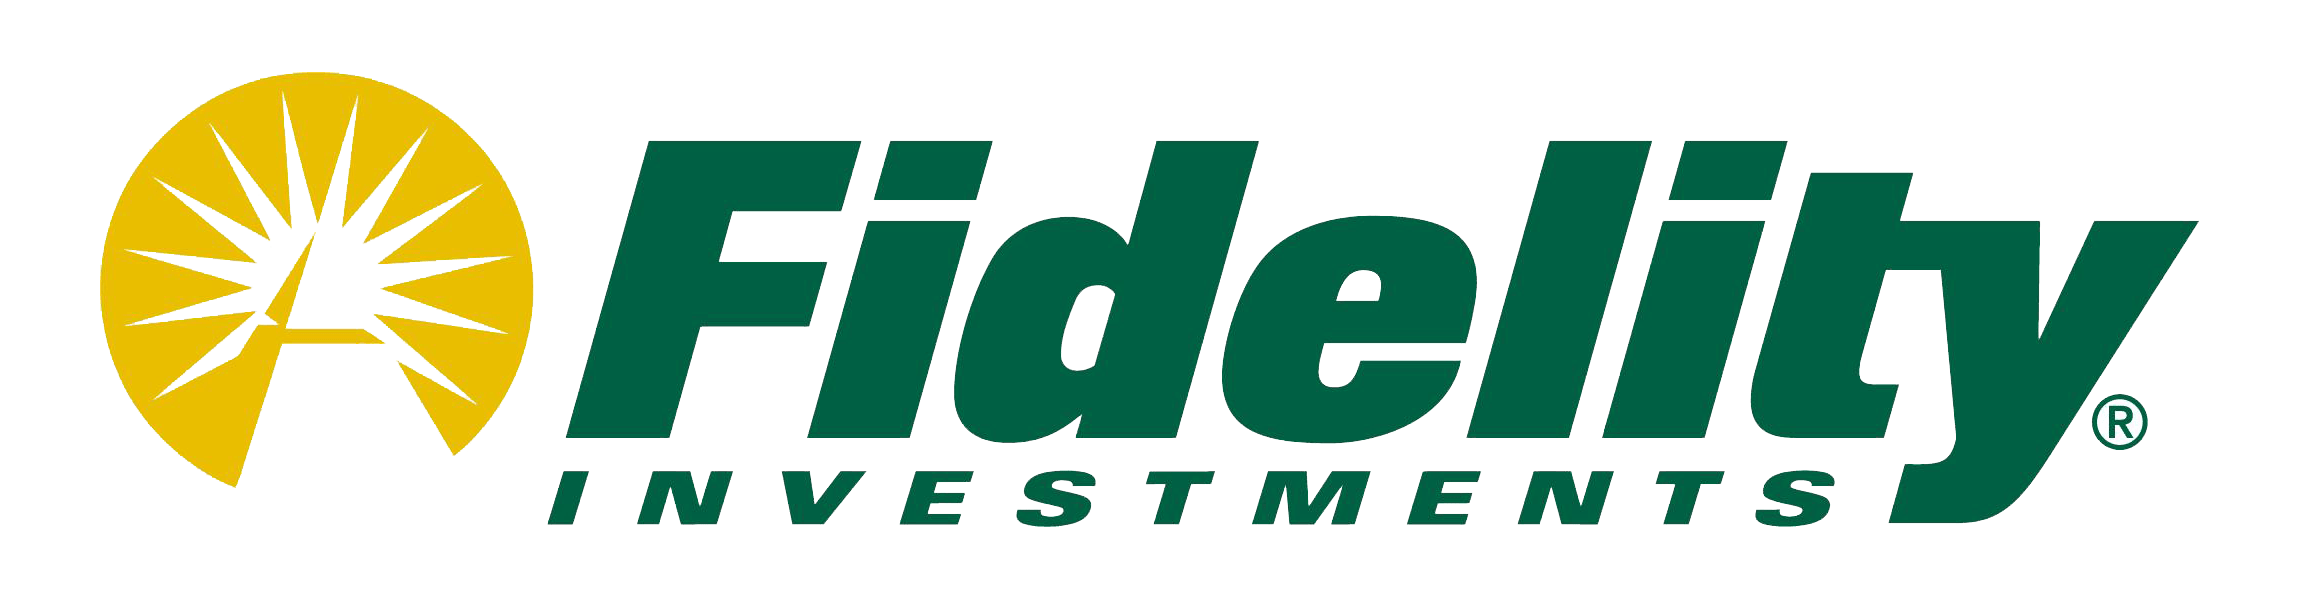 Fidelity Investments - Dervla Traino